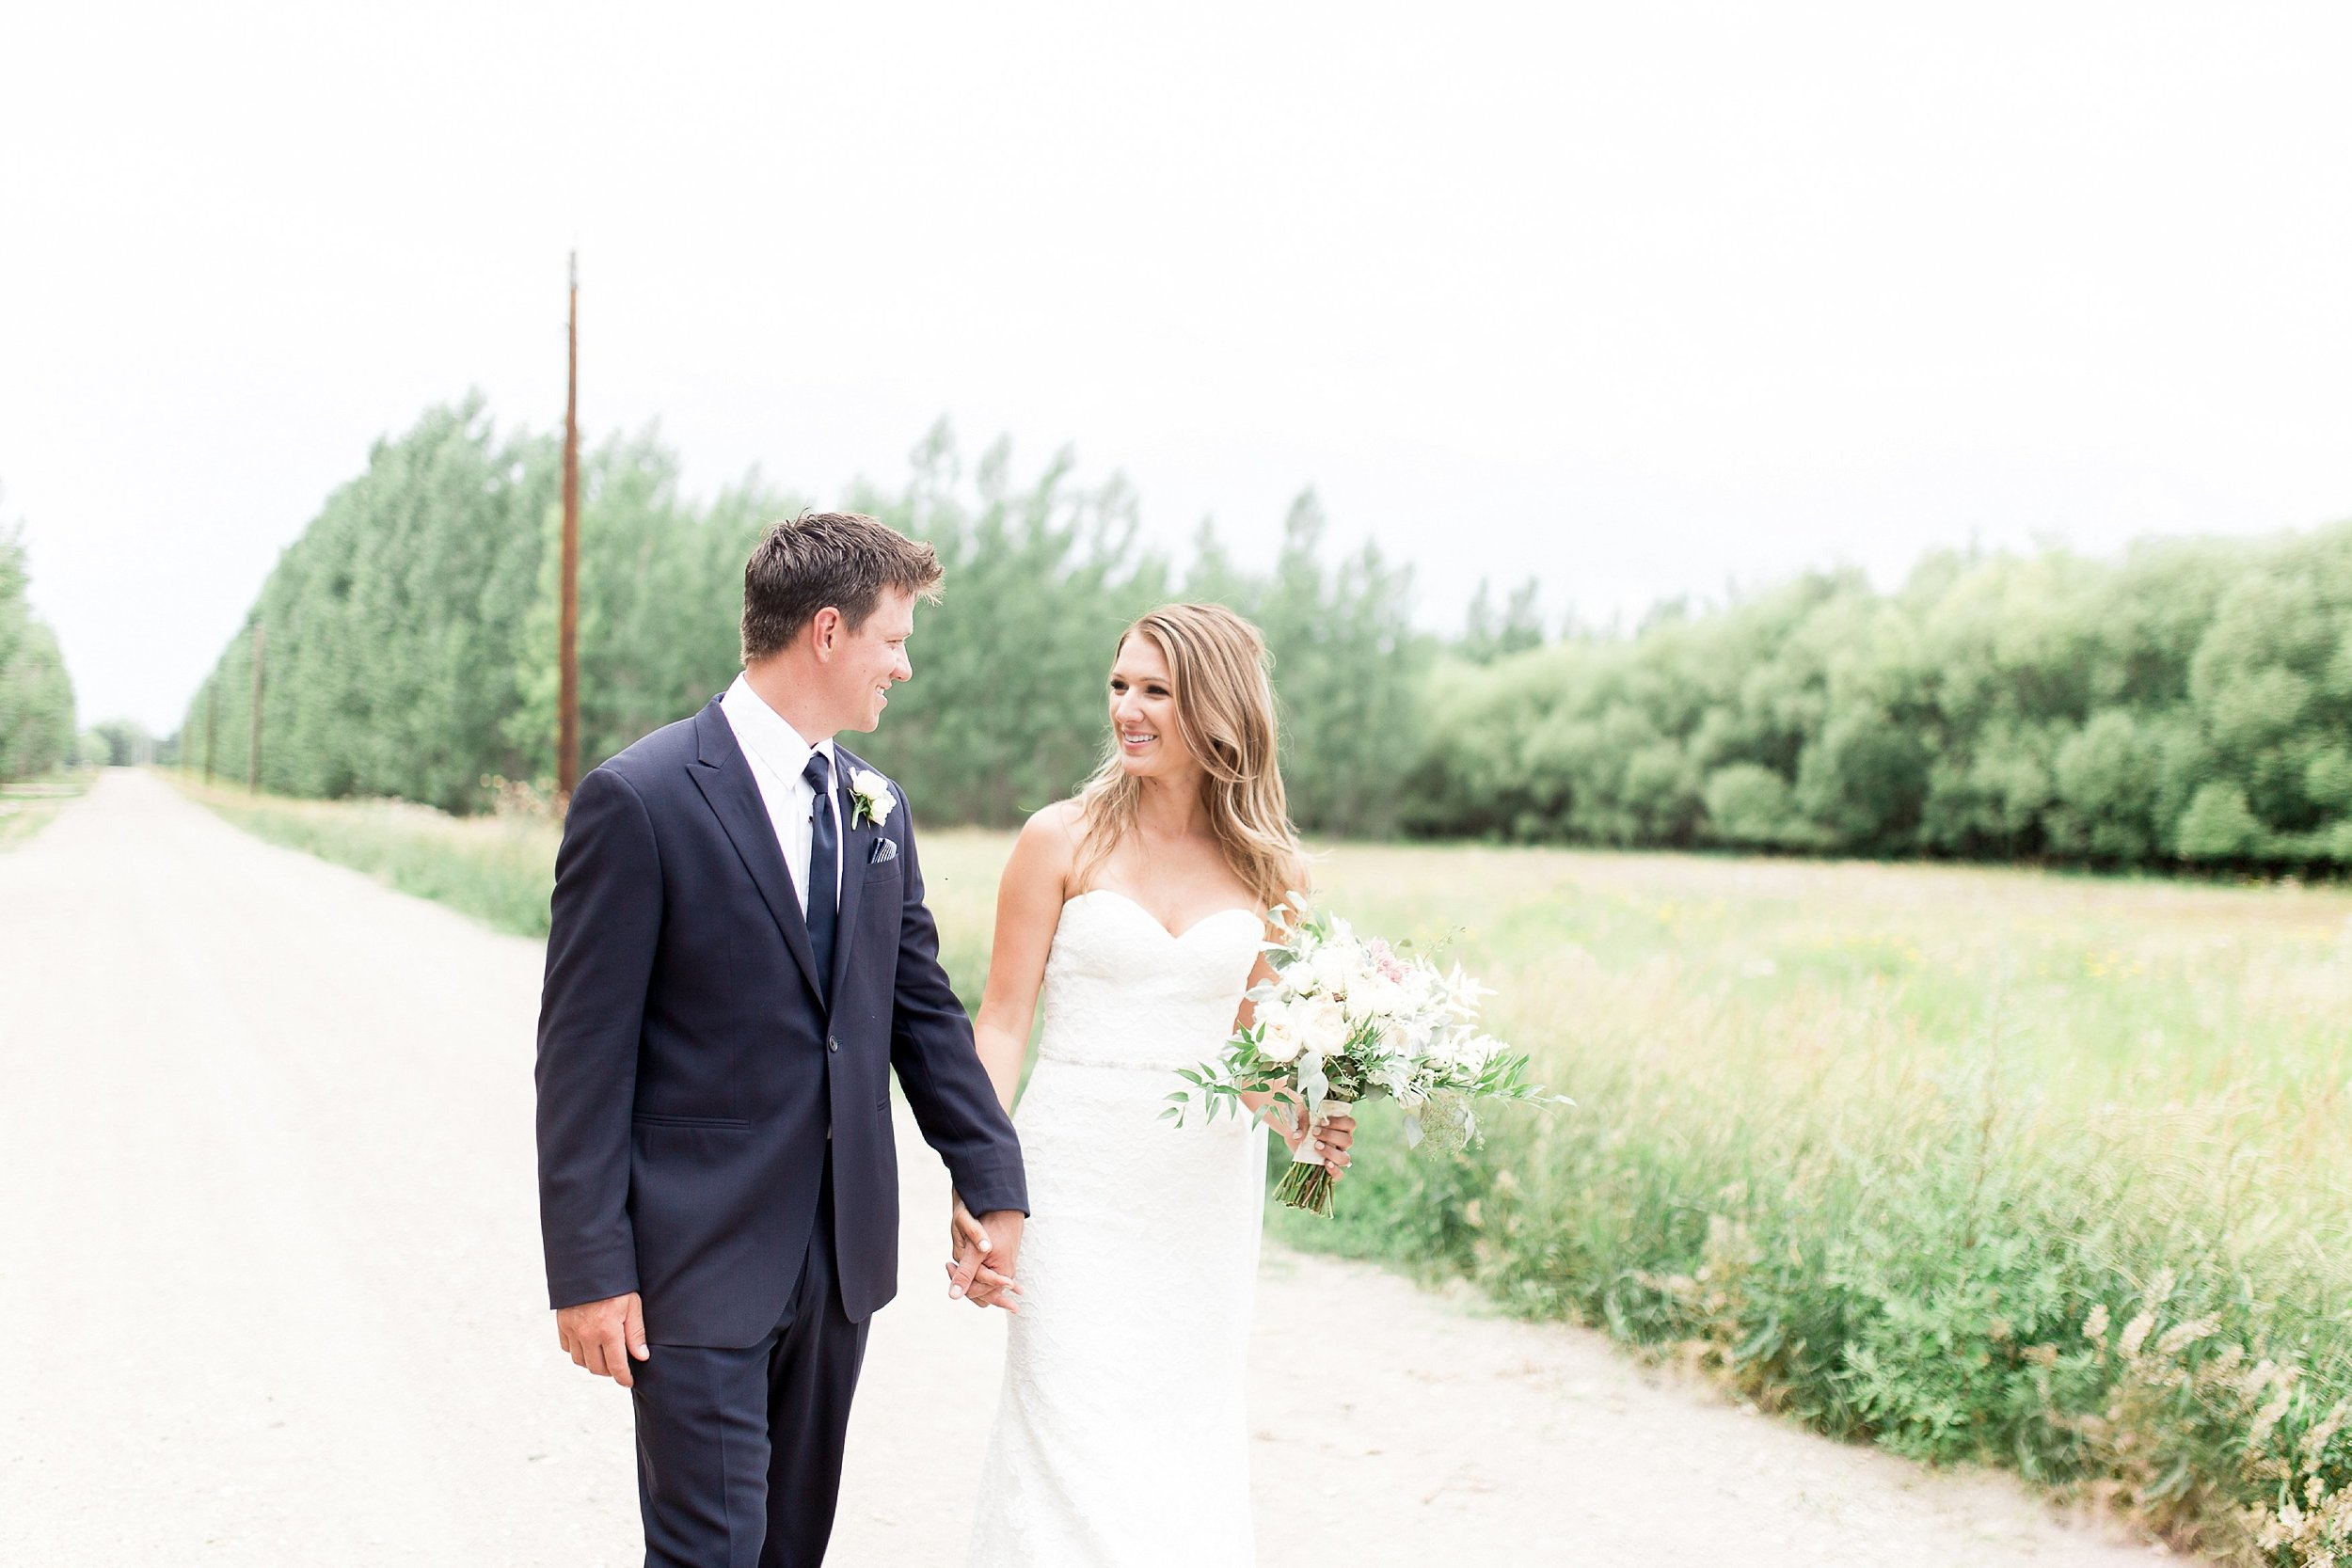 winnipeg wedding photographer   Keila Marie Photography   romantic Bride and groom portraits  Garden inspired wedding